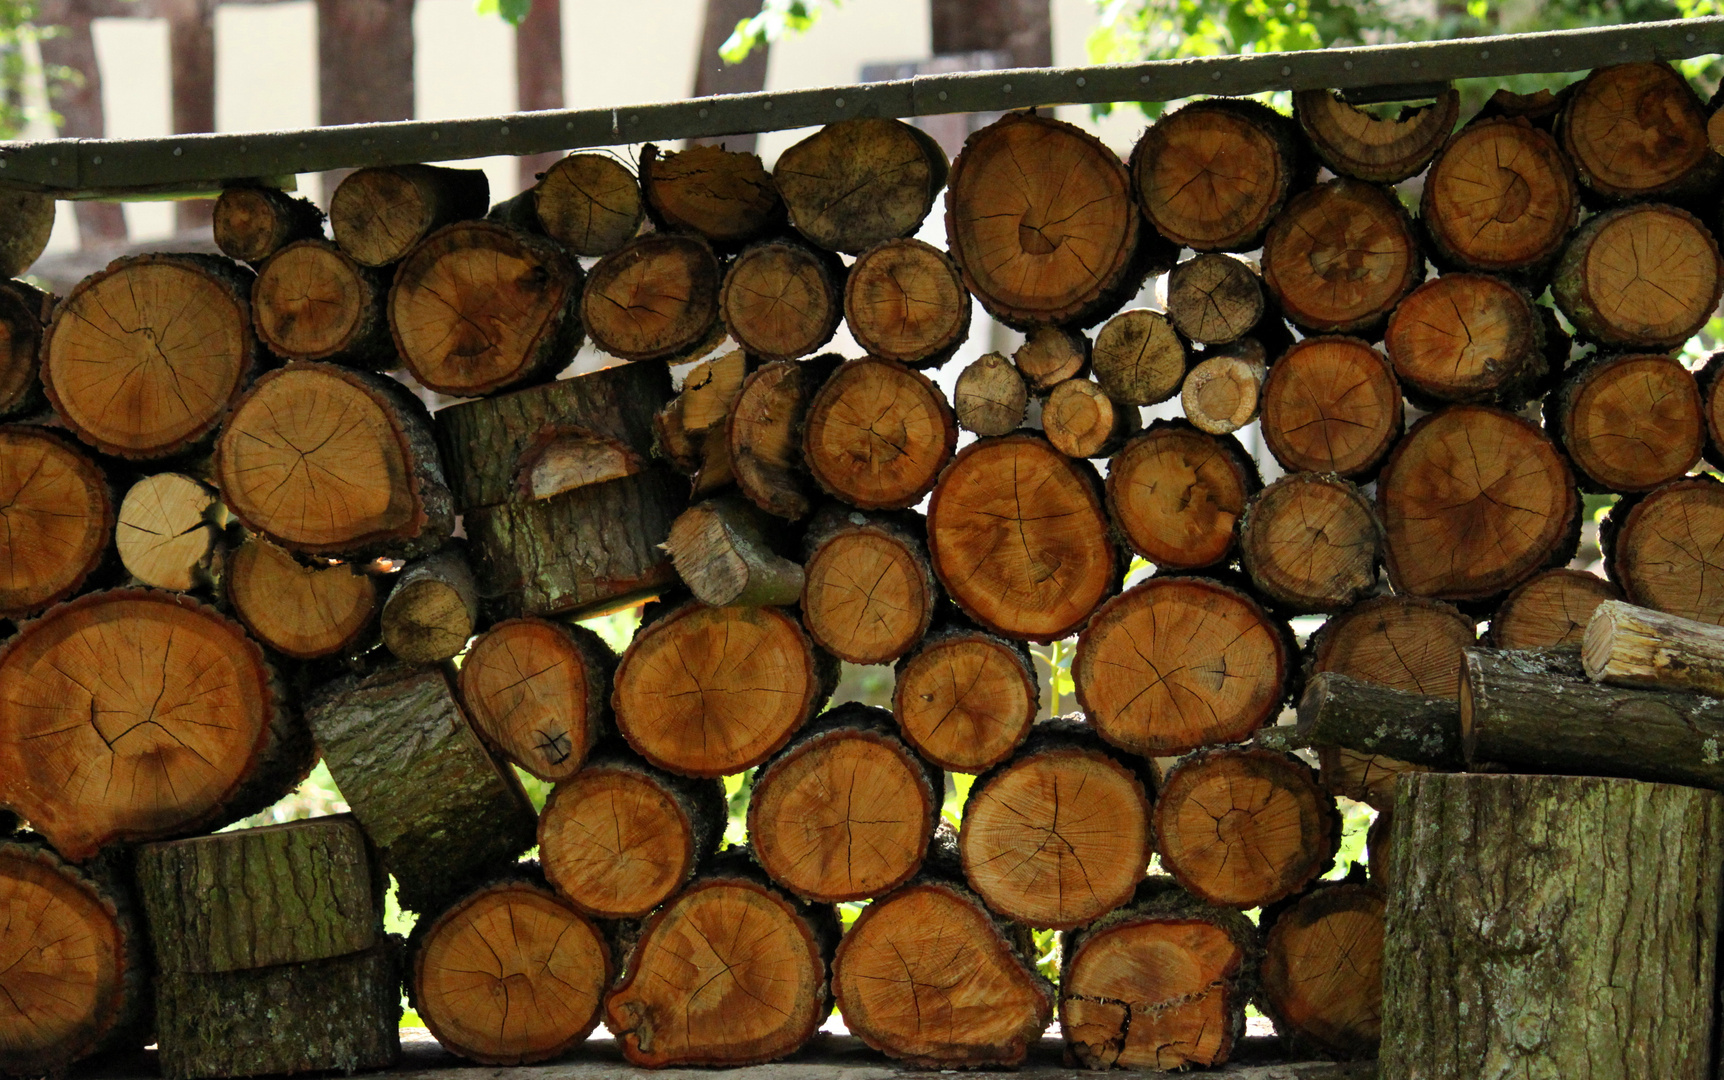 Holz - Stapel - Kunst